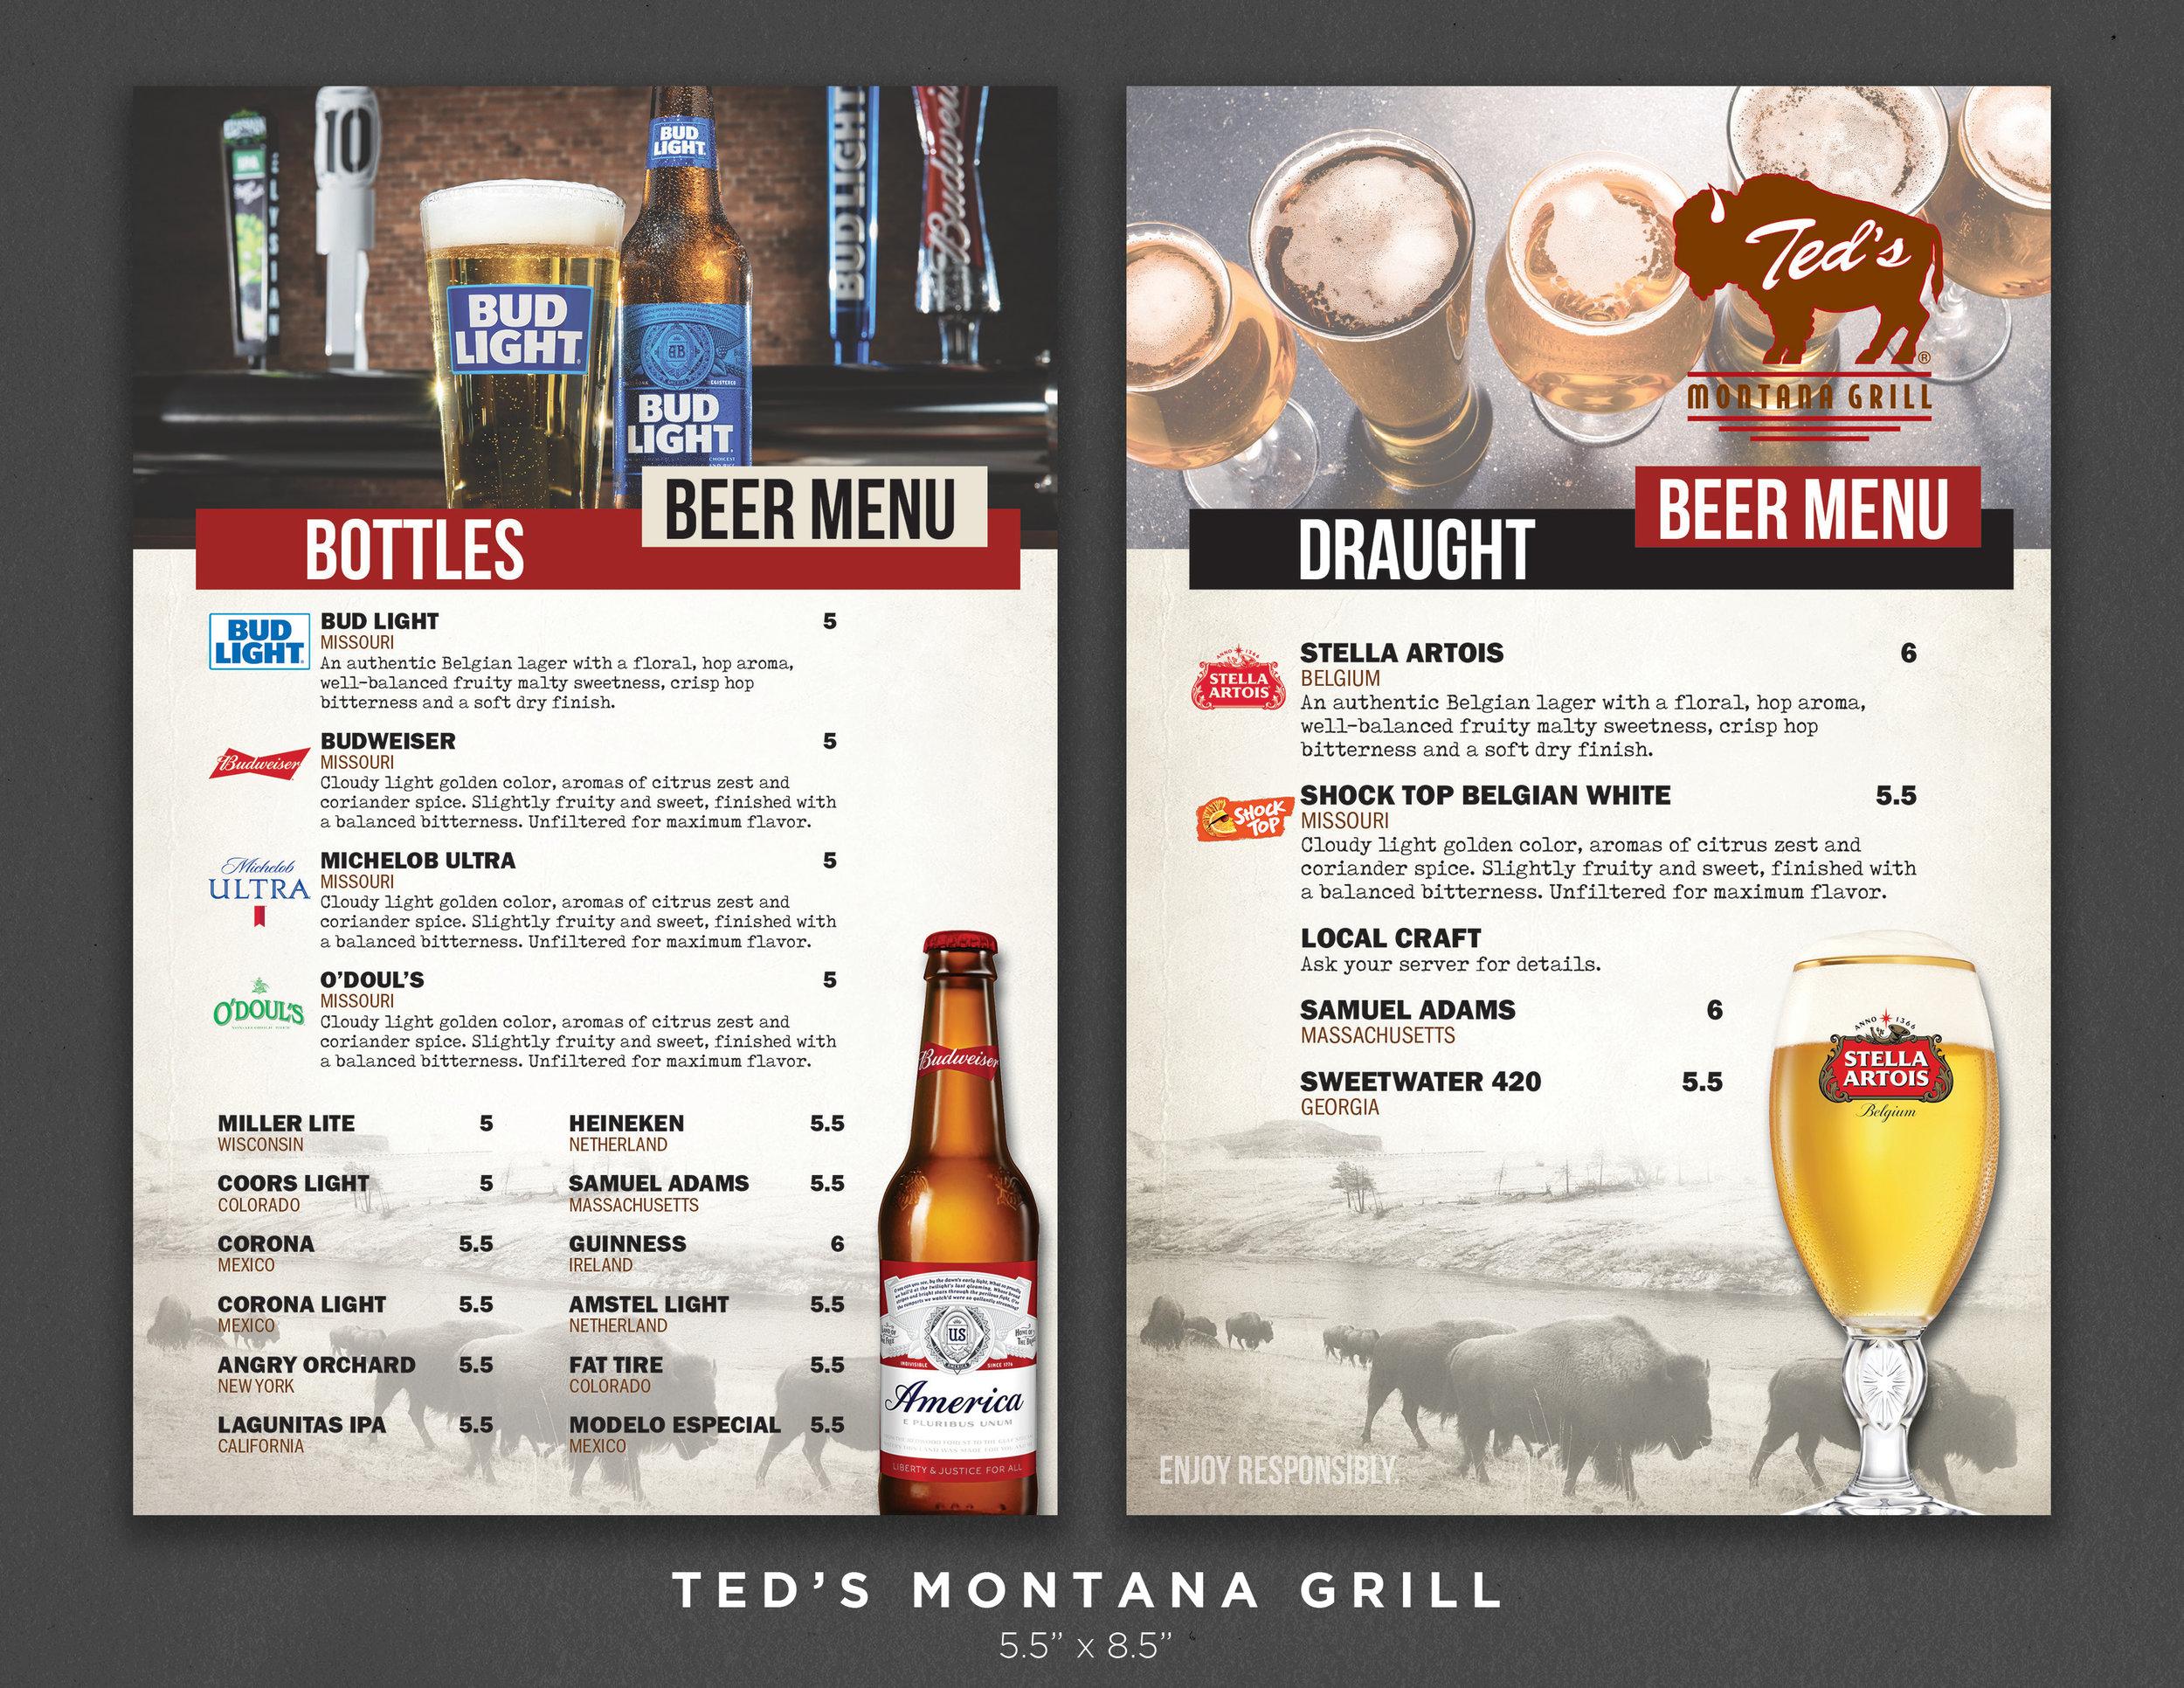 Teds Montana Grill.jpg